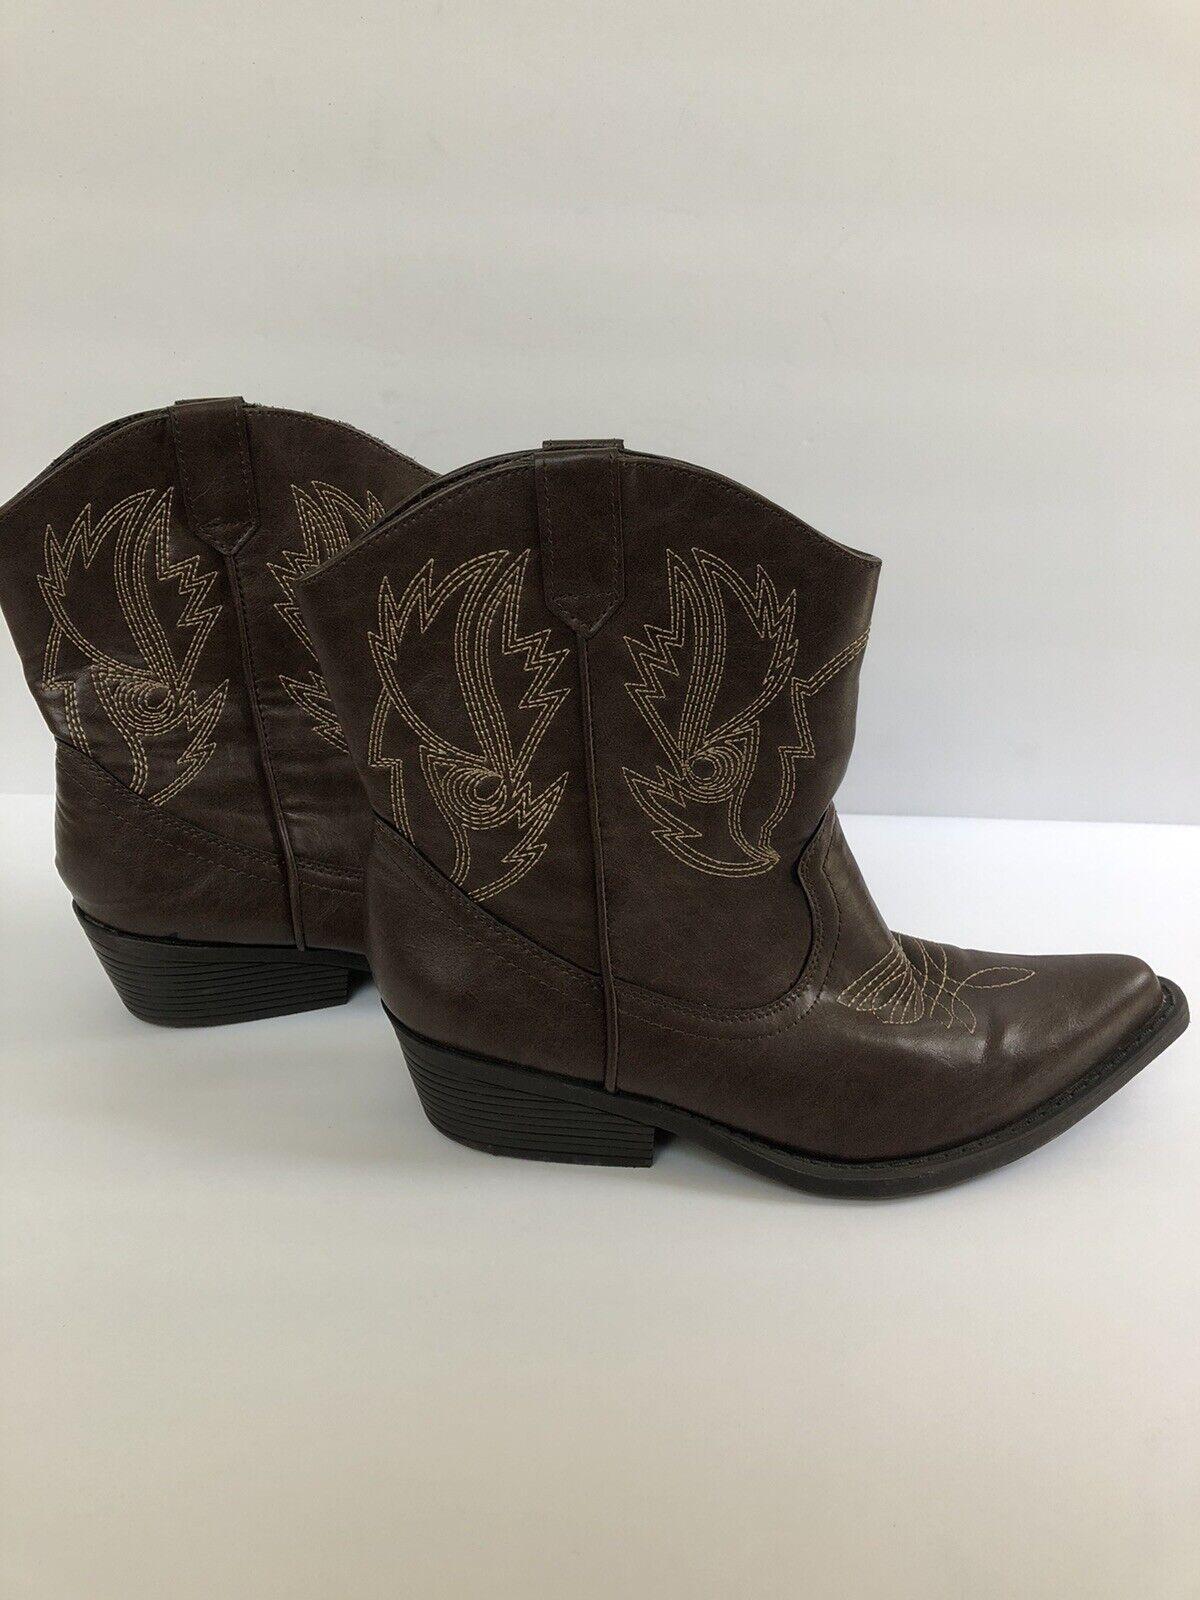 Women's So Calf-High Cowboy Western Boots Brown Sz 7, Concert, Country, Festival